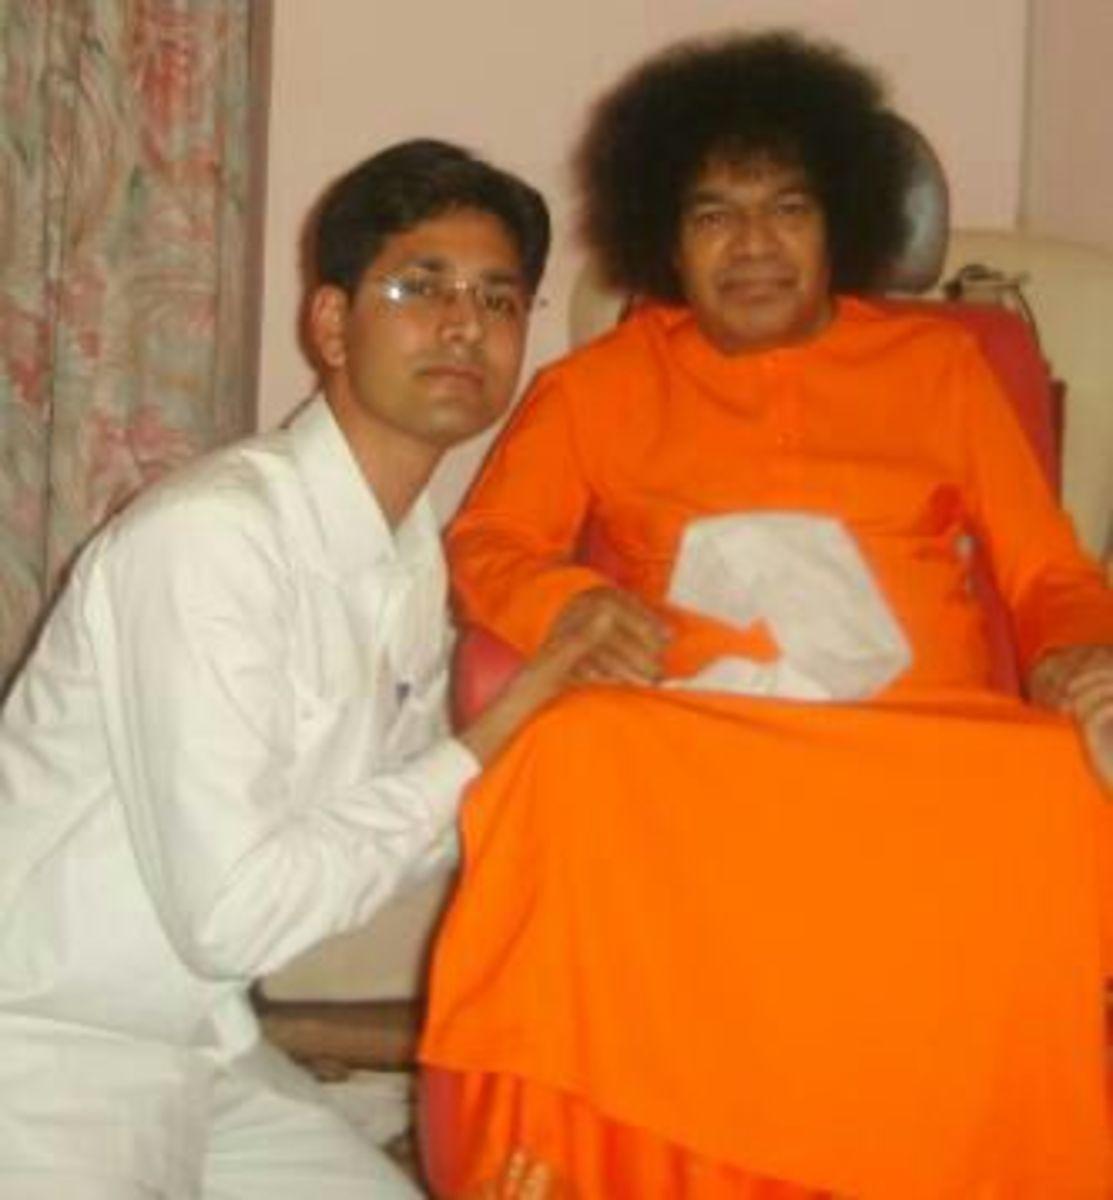 Tarashankar Chakravarthy con su amado Swami en la sala de entrevistas.